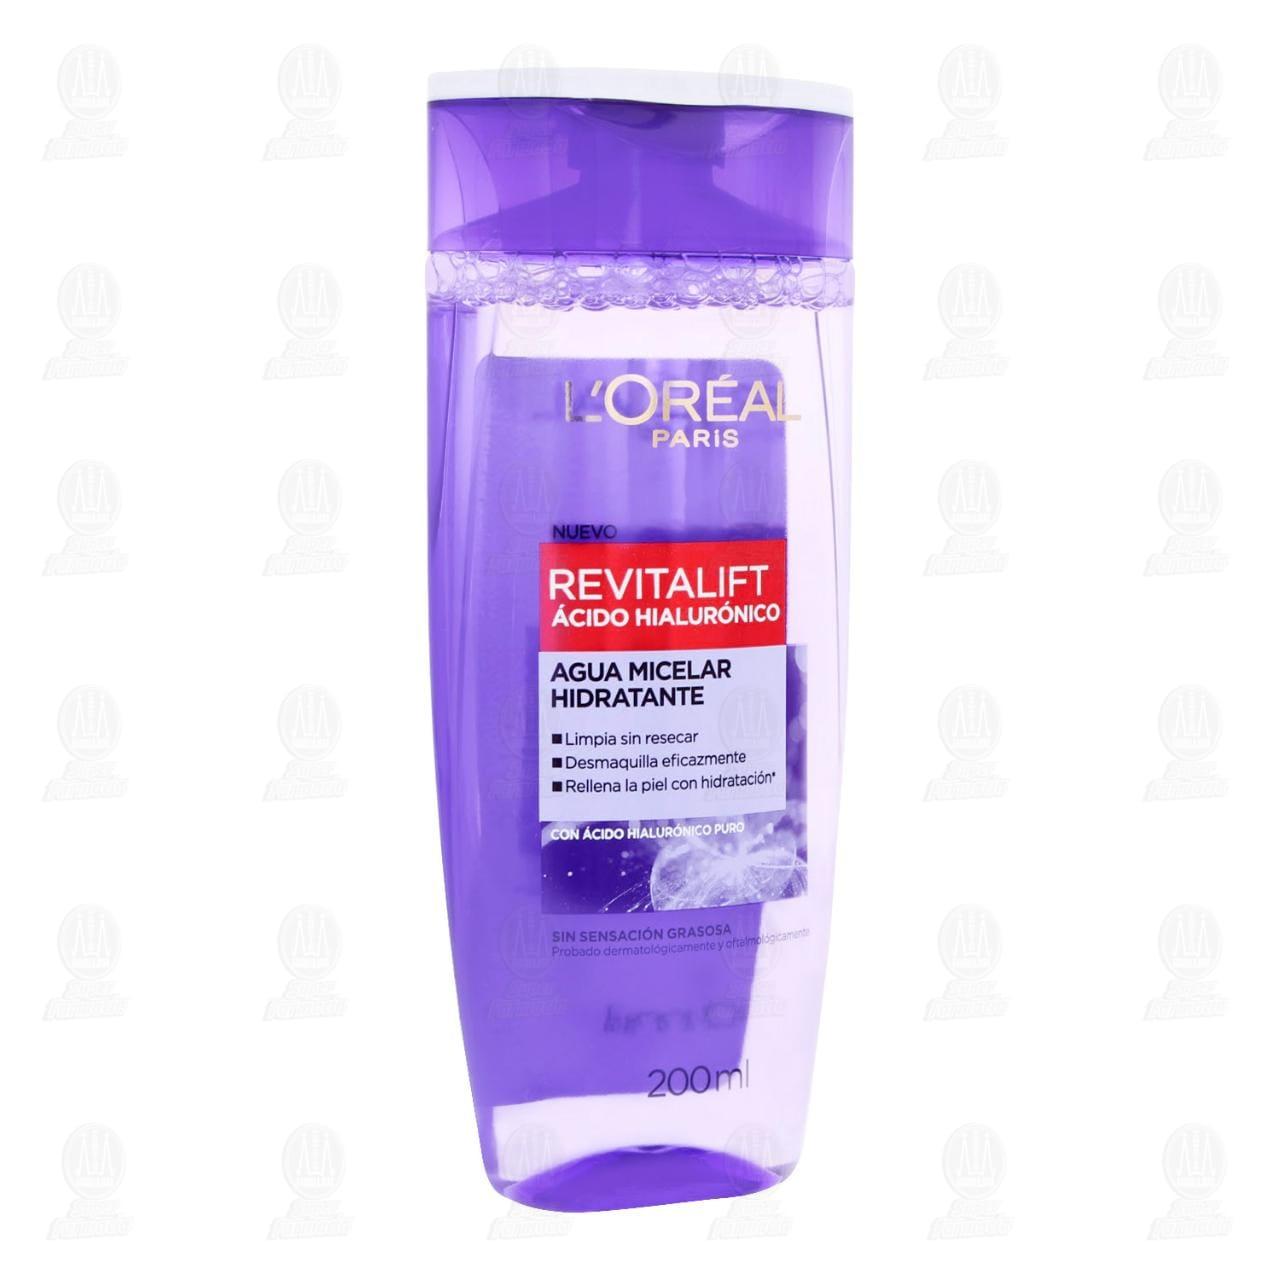 Comprar Agua Micelar L'Oréal Paris Revitalift Ácido Hialurónico, 200 ml. en Farmacias Guadalajara